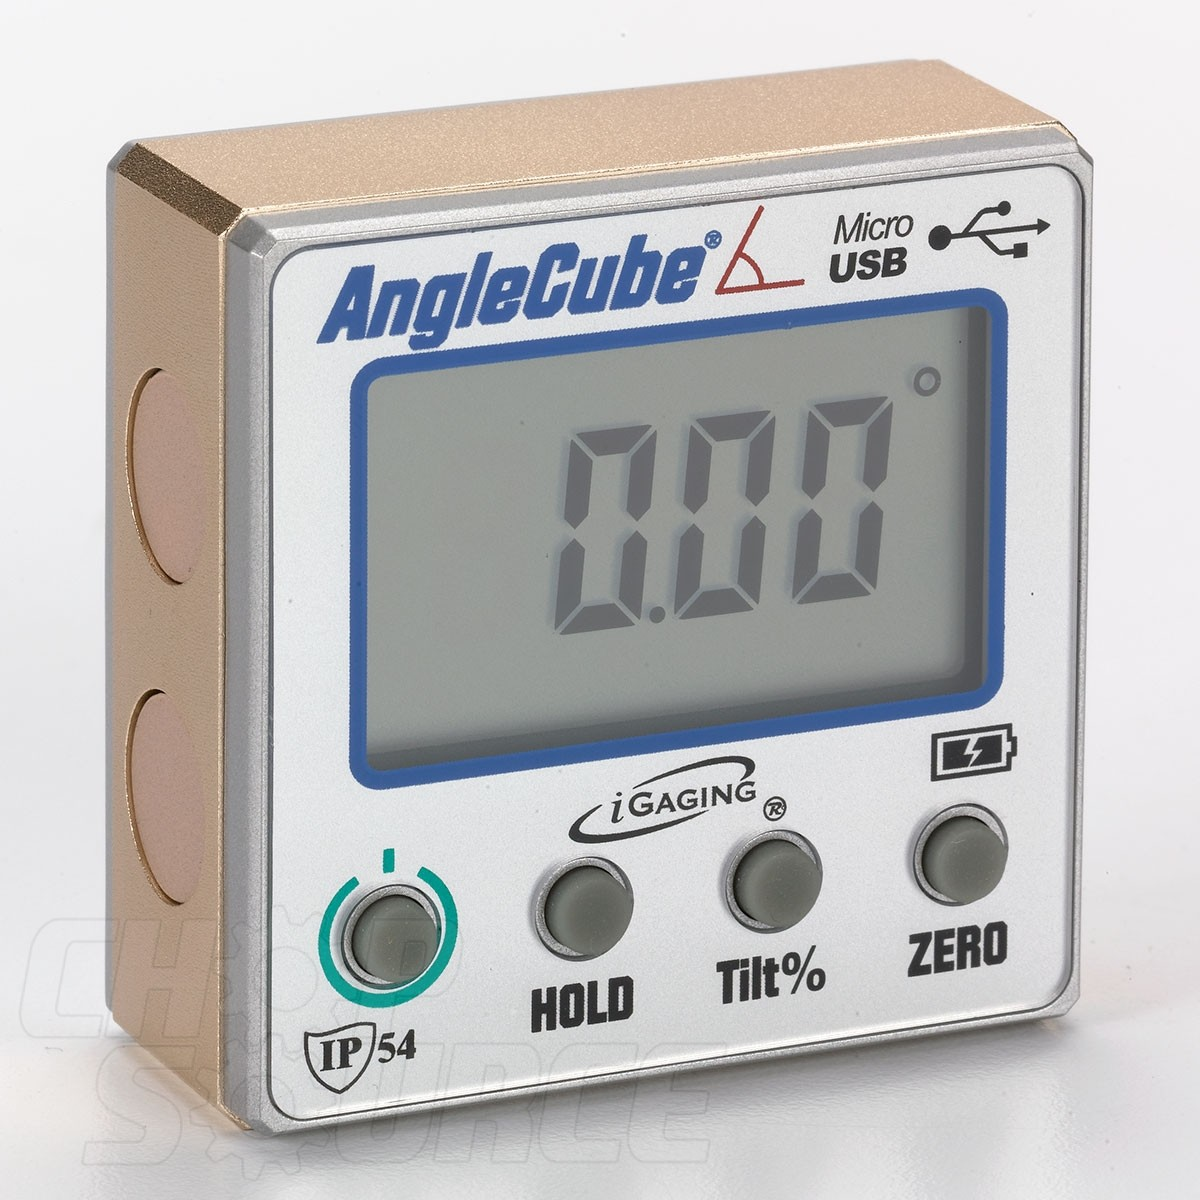 AngleCube - Digital Angle Finder - Gen 3 - Front